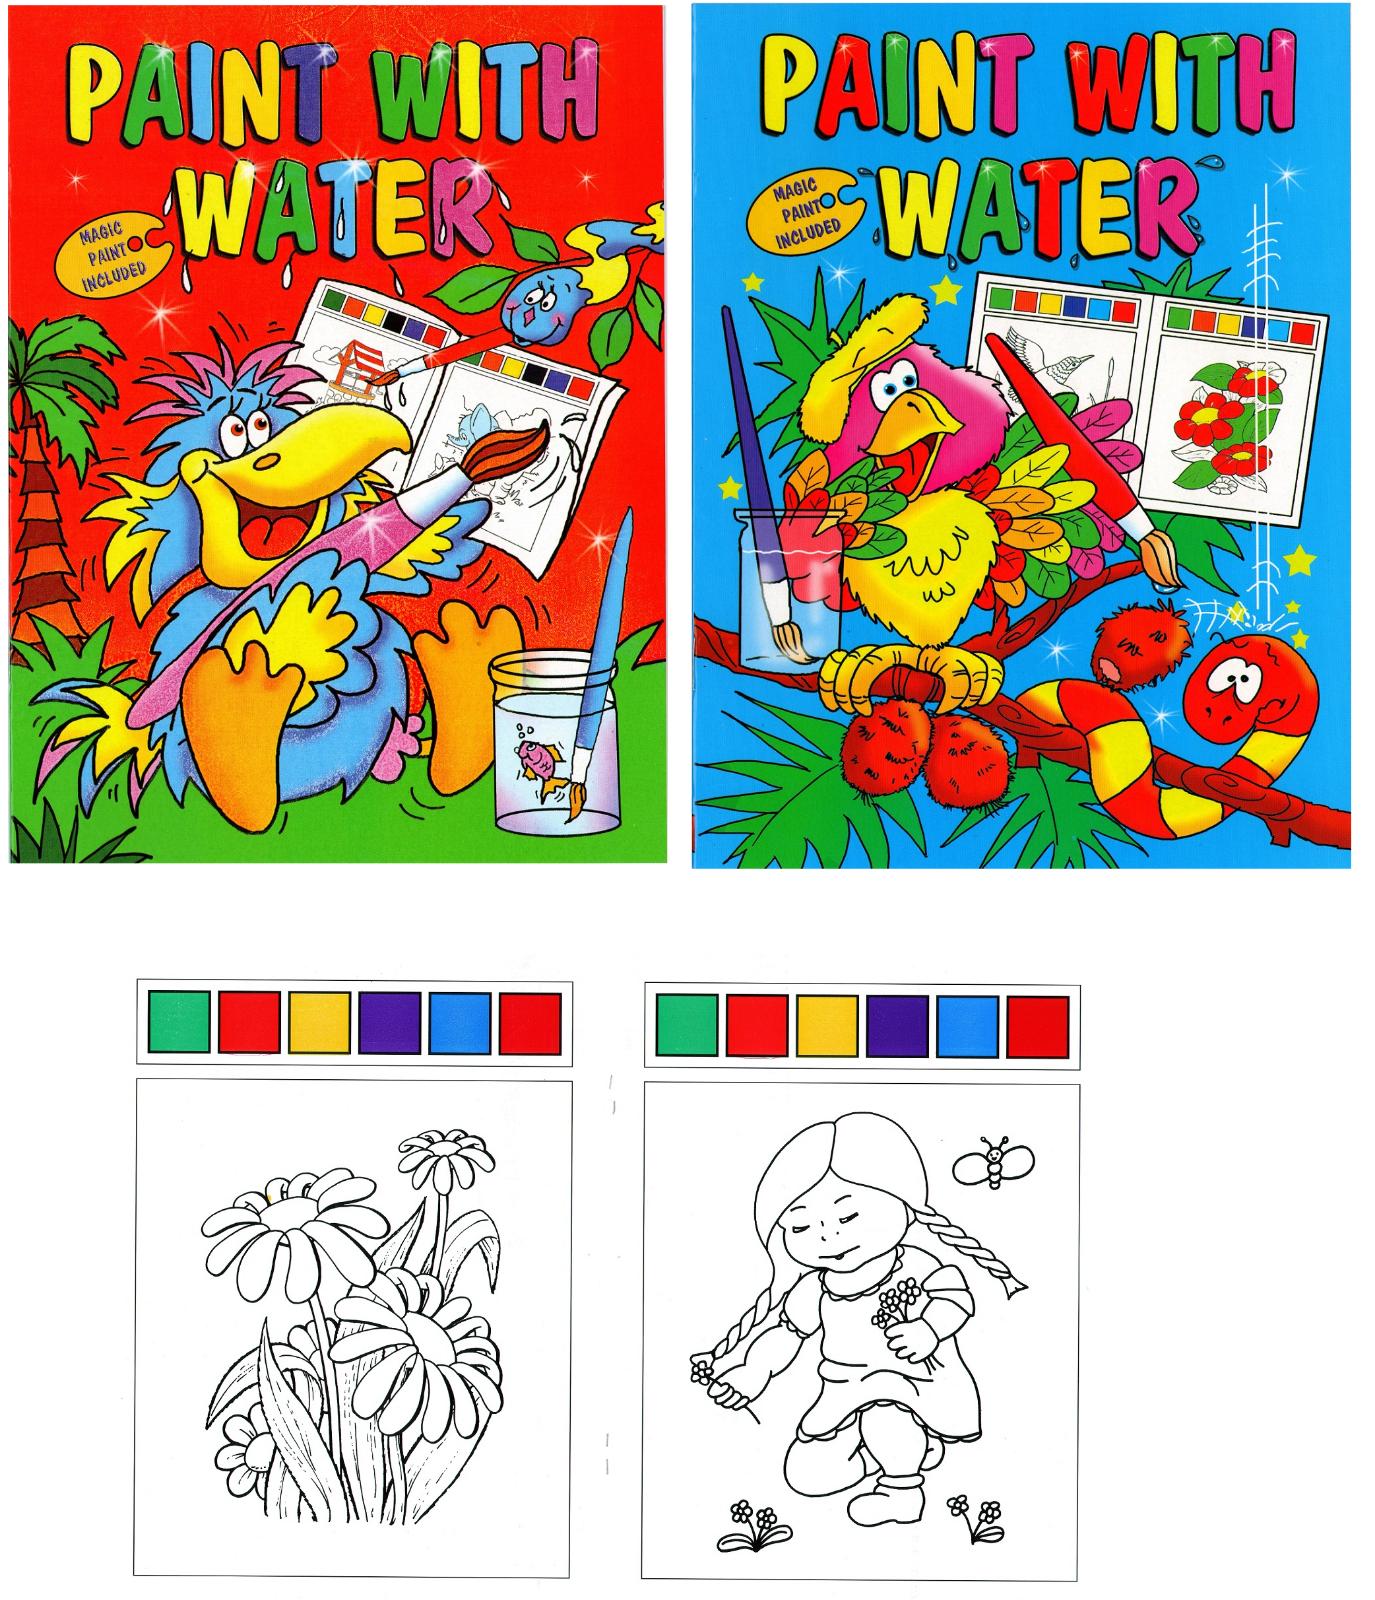 MAGIC PAINTING BOOK /& BRUSH Choose Design,Create Art Use Water,Boys,Girls,Gift